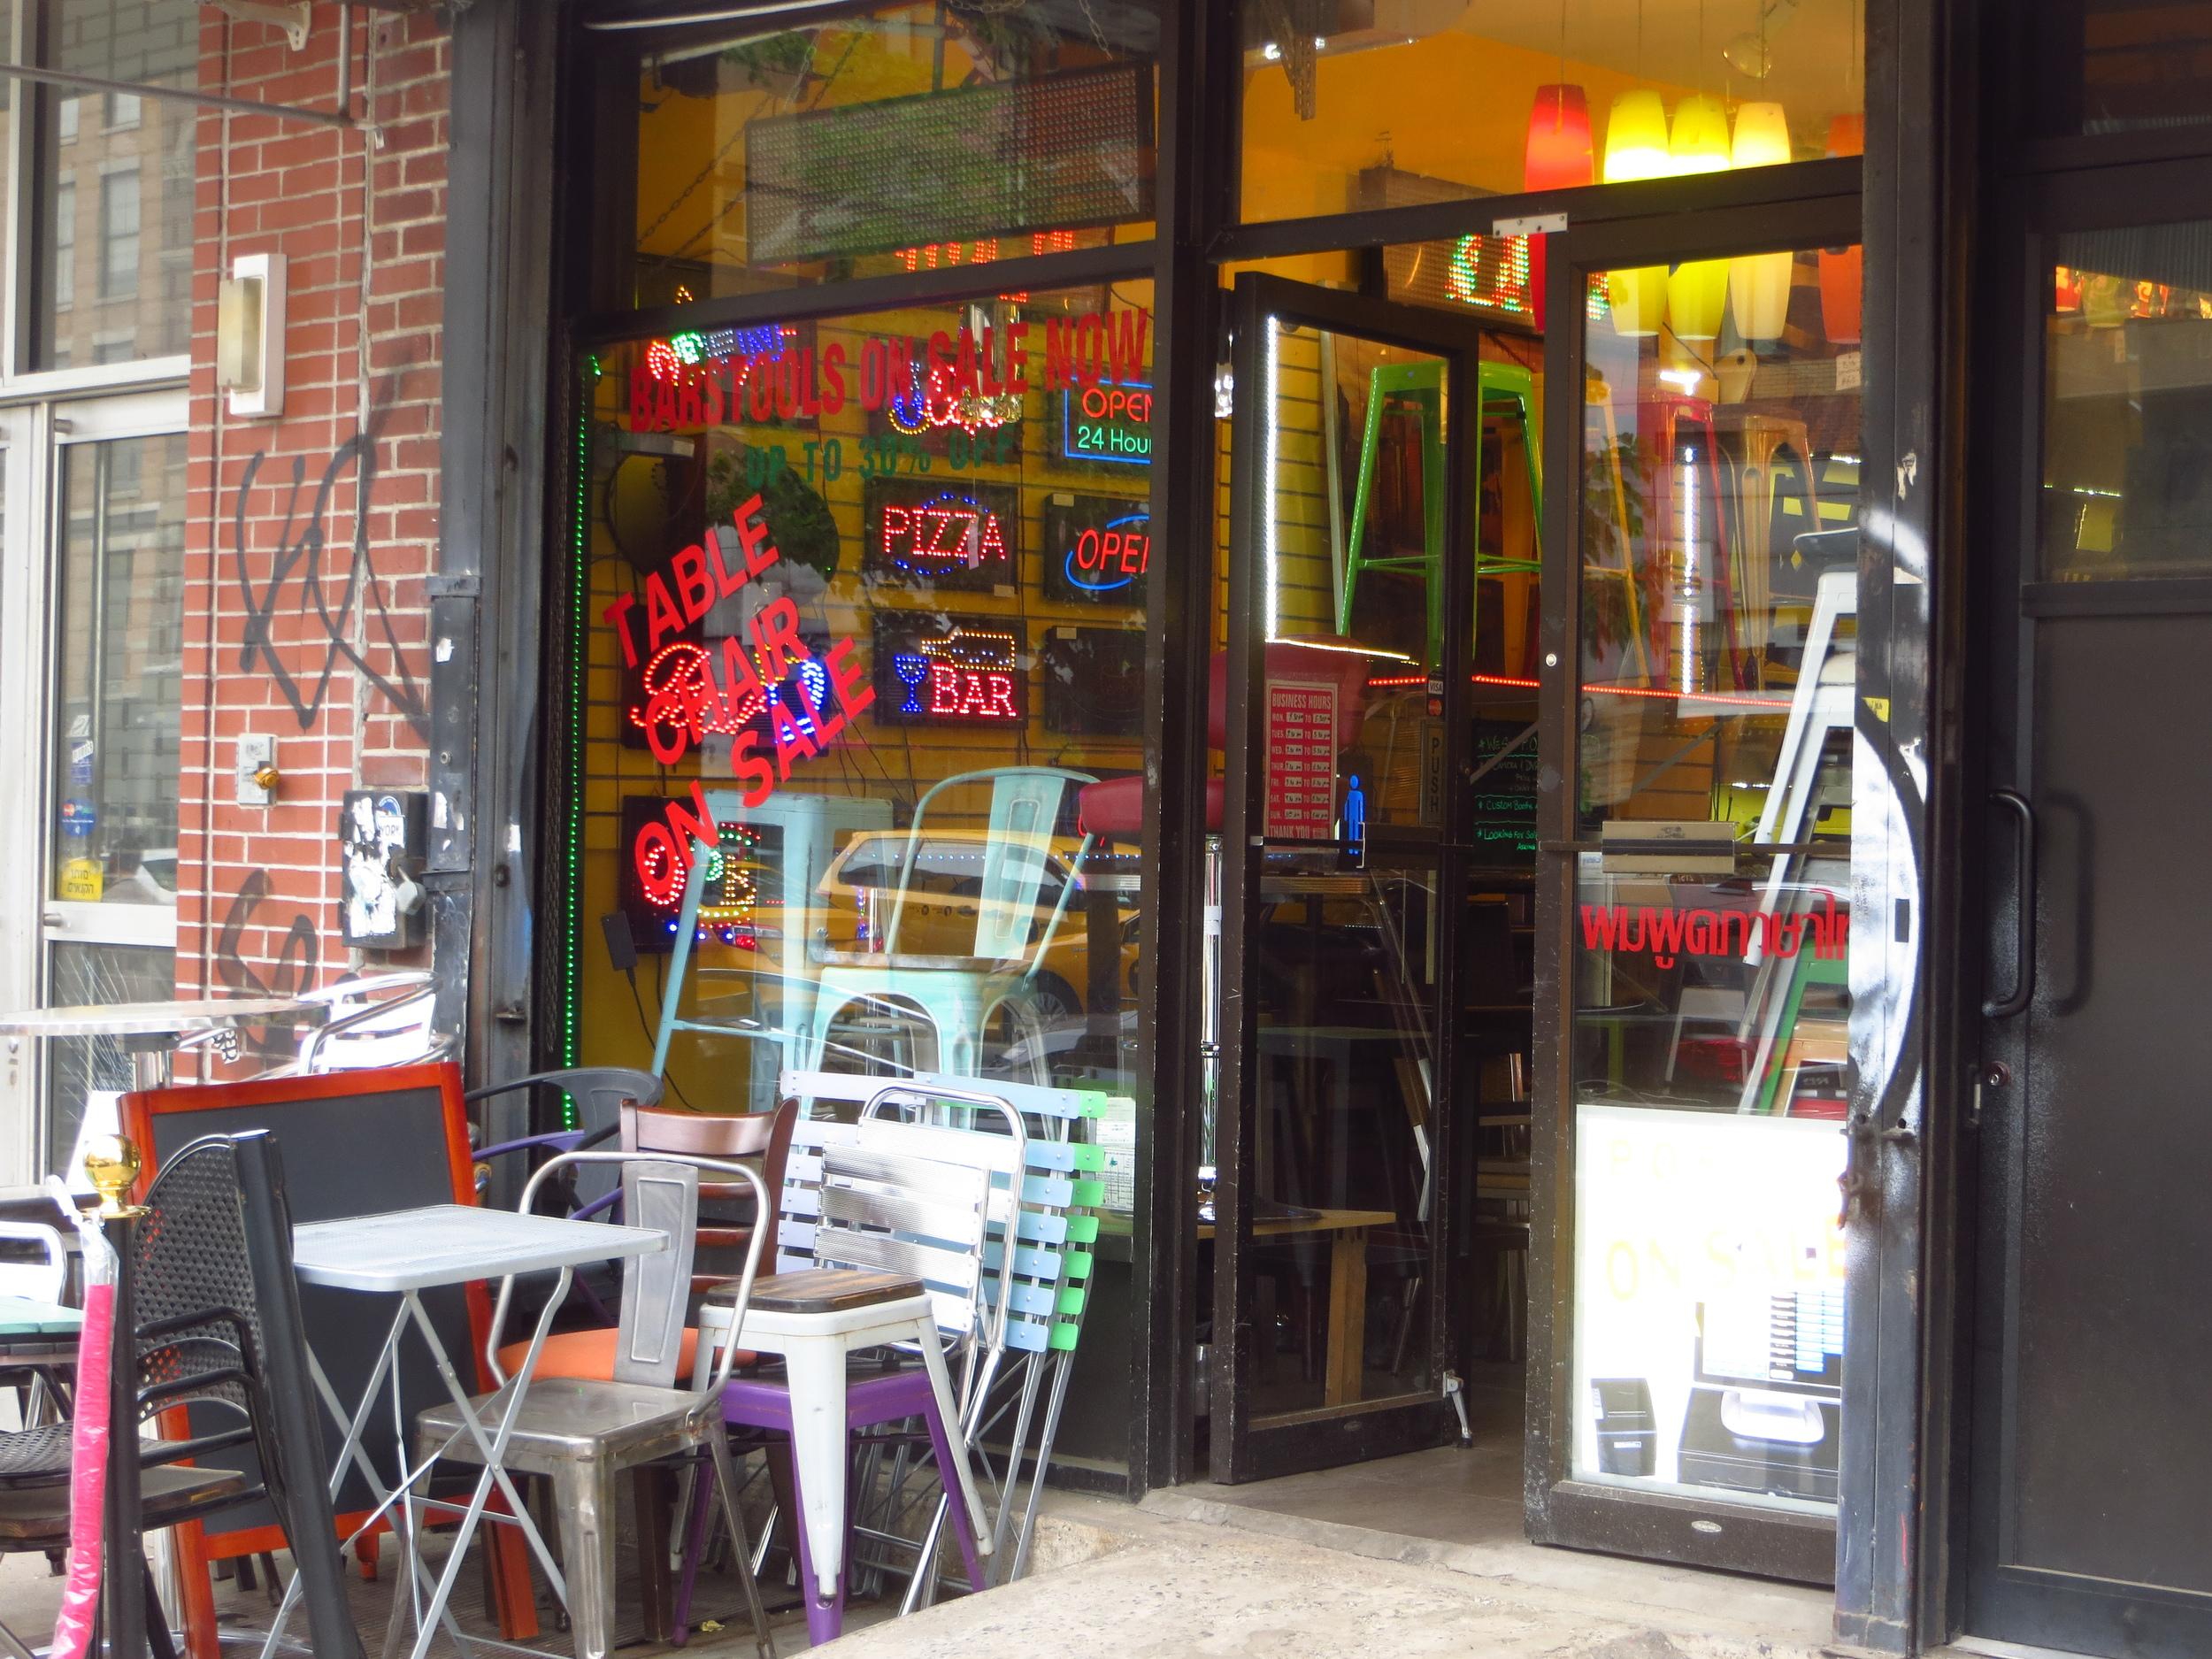 Restaurant supply store